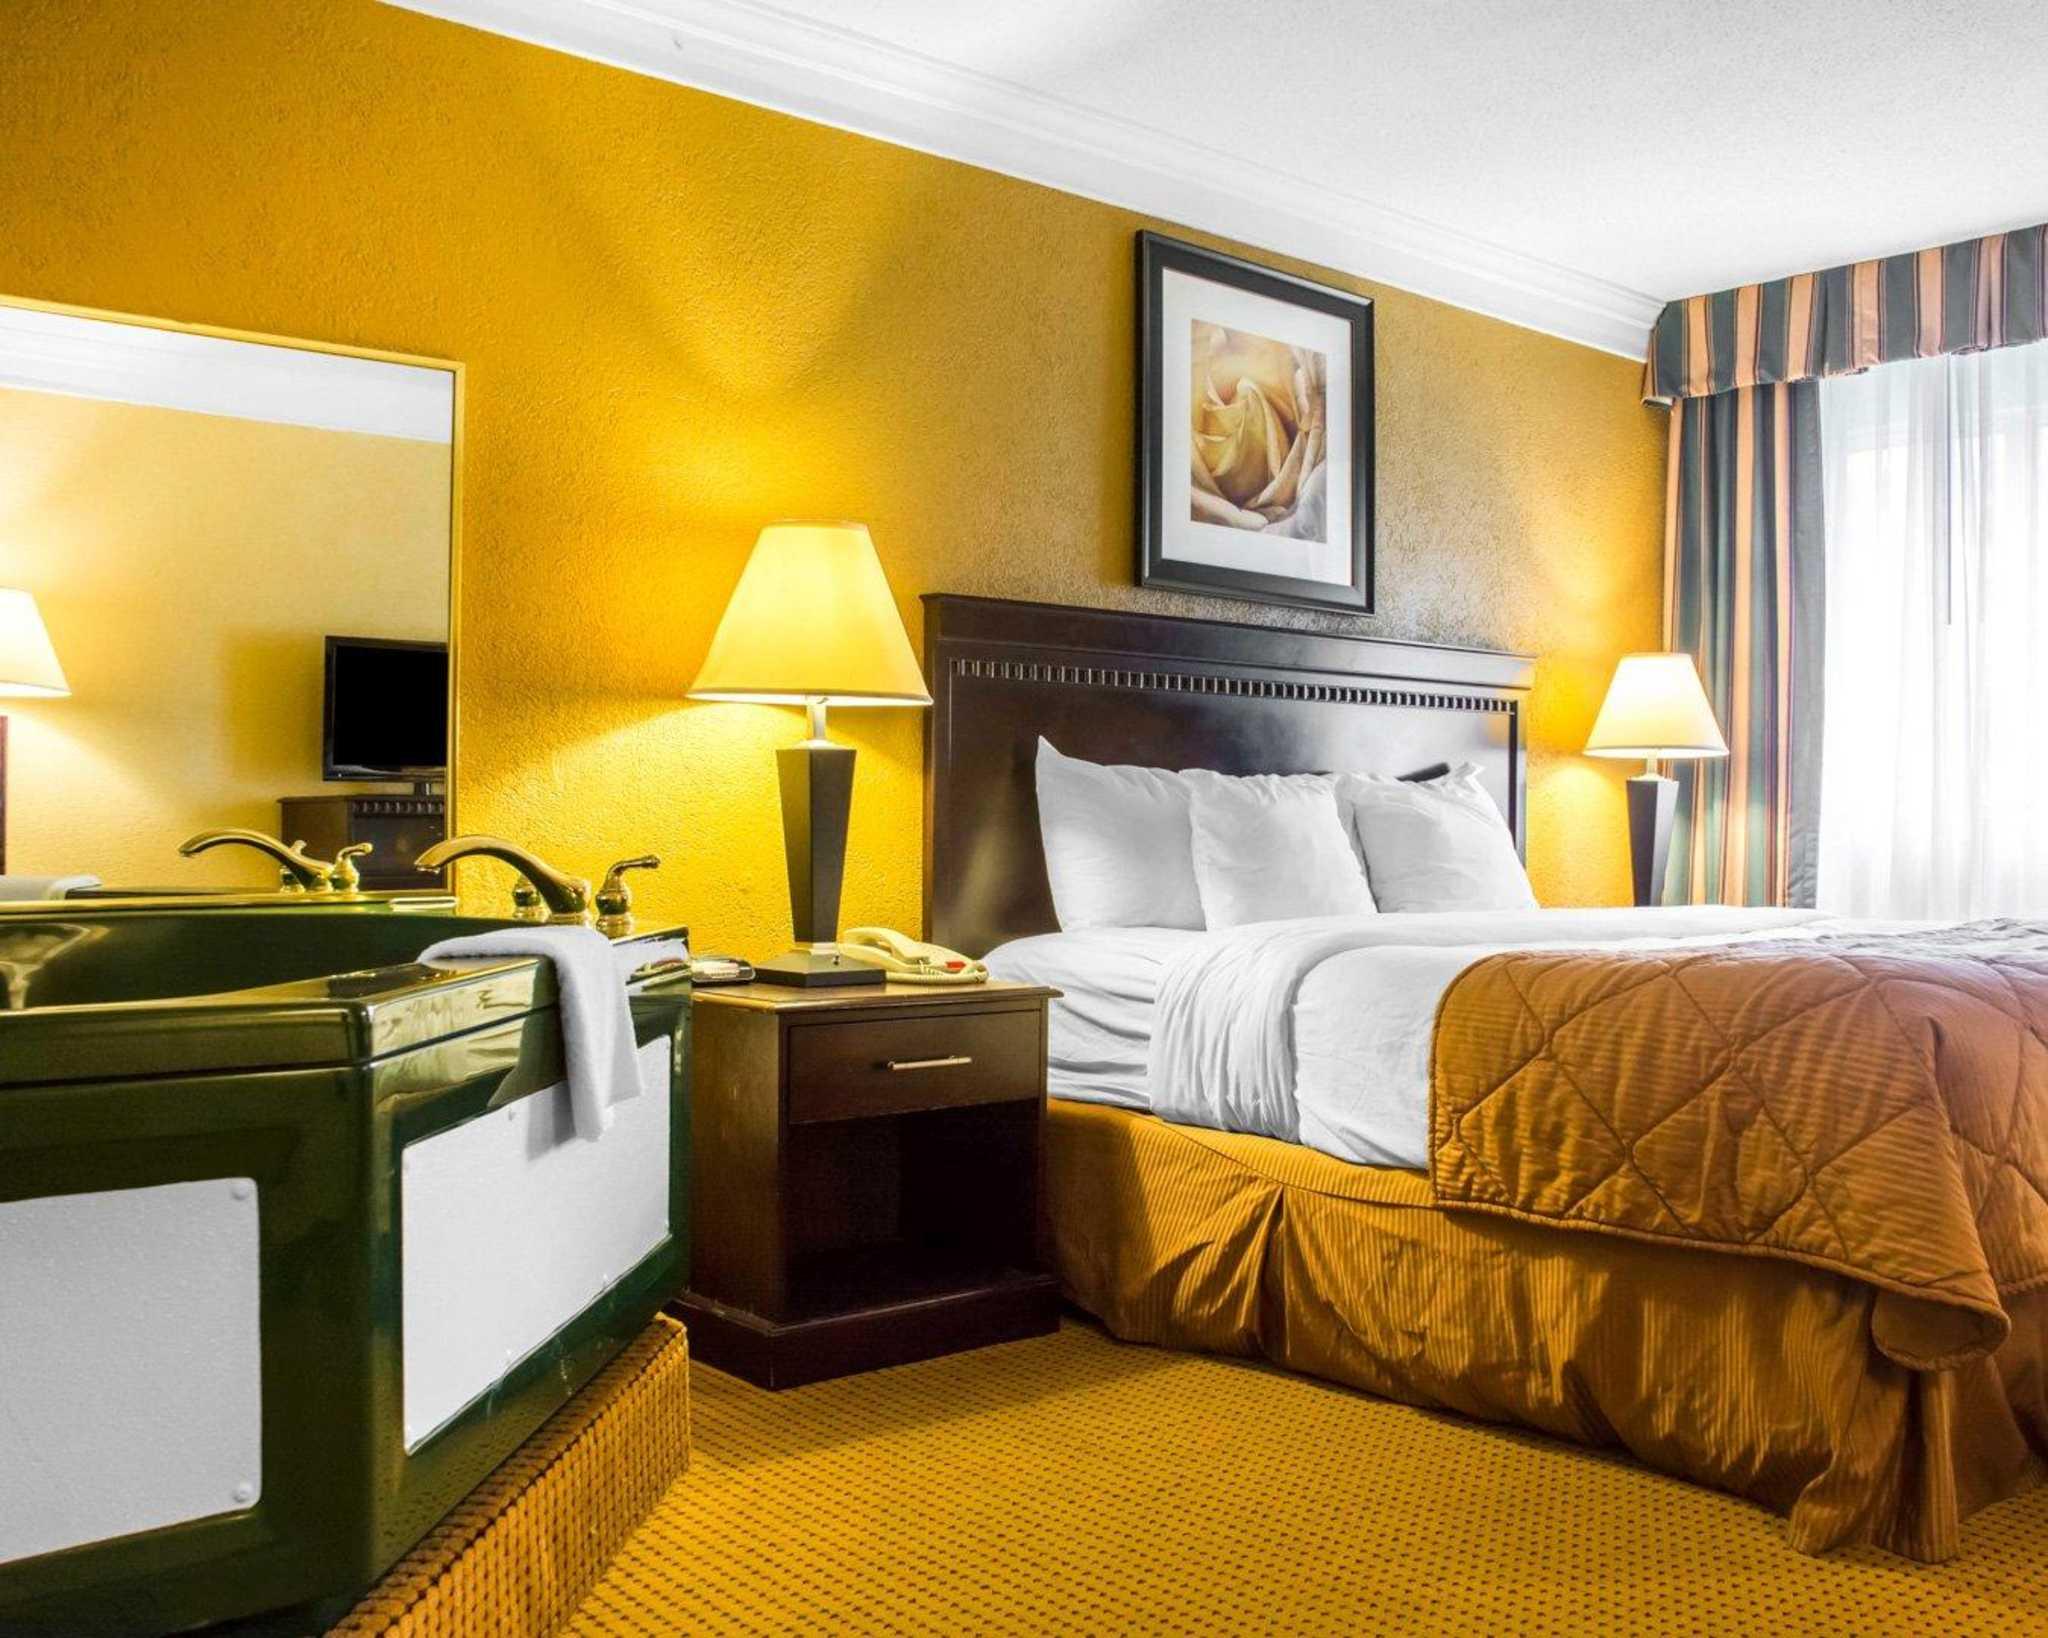 Quality Inn & Suites Fairgrounds image 20